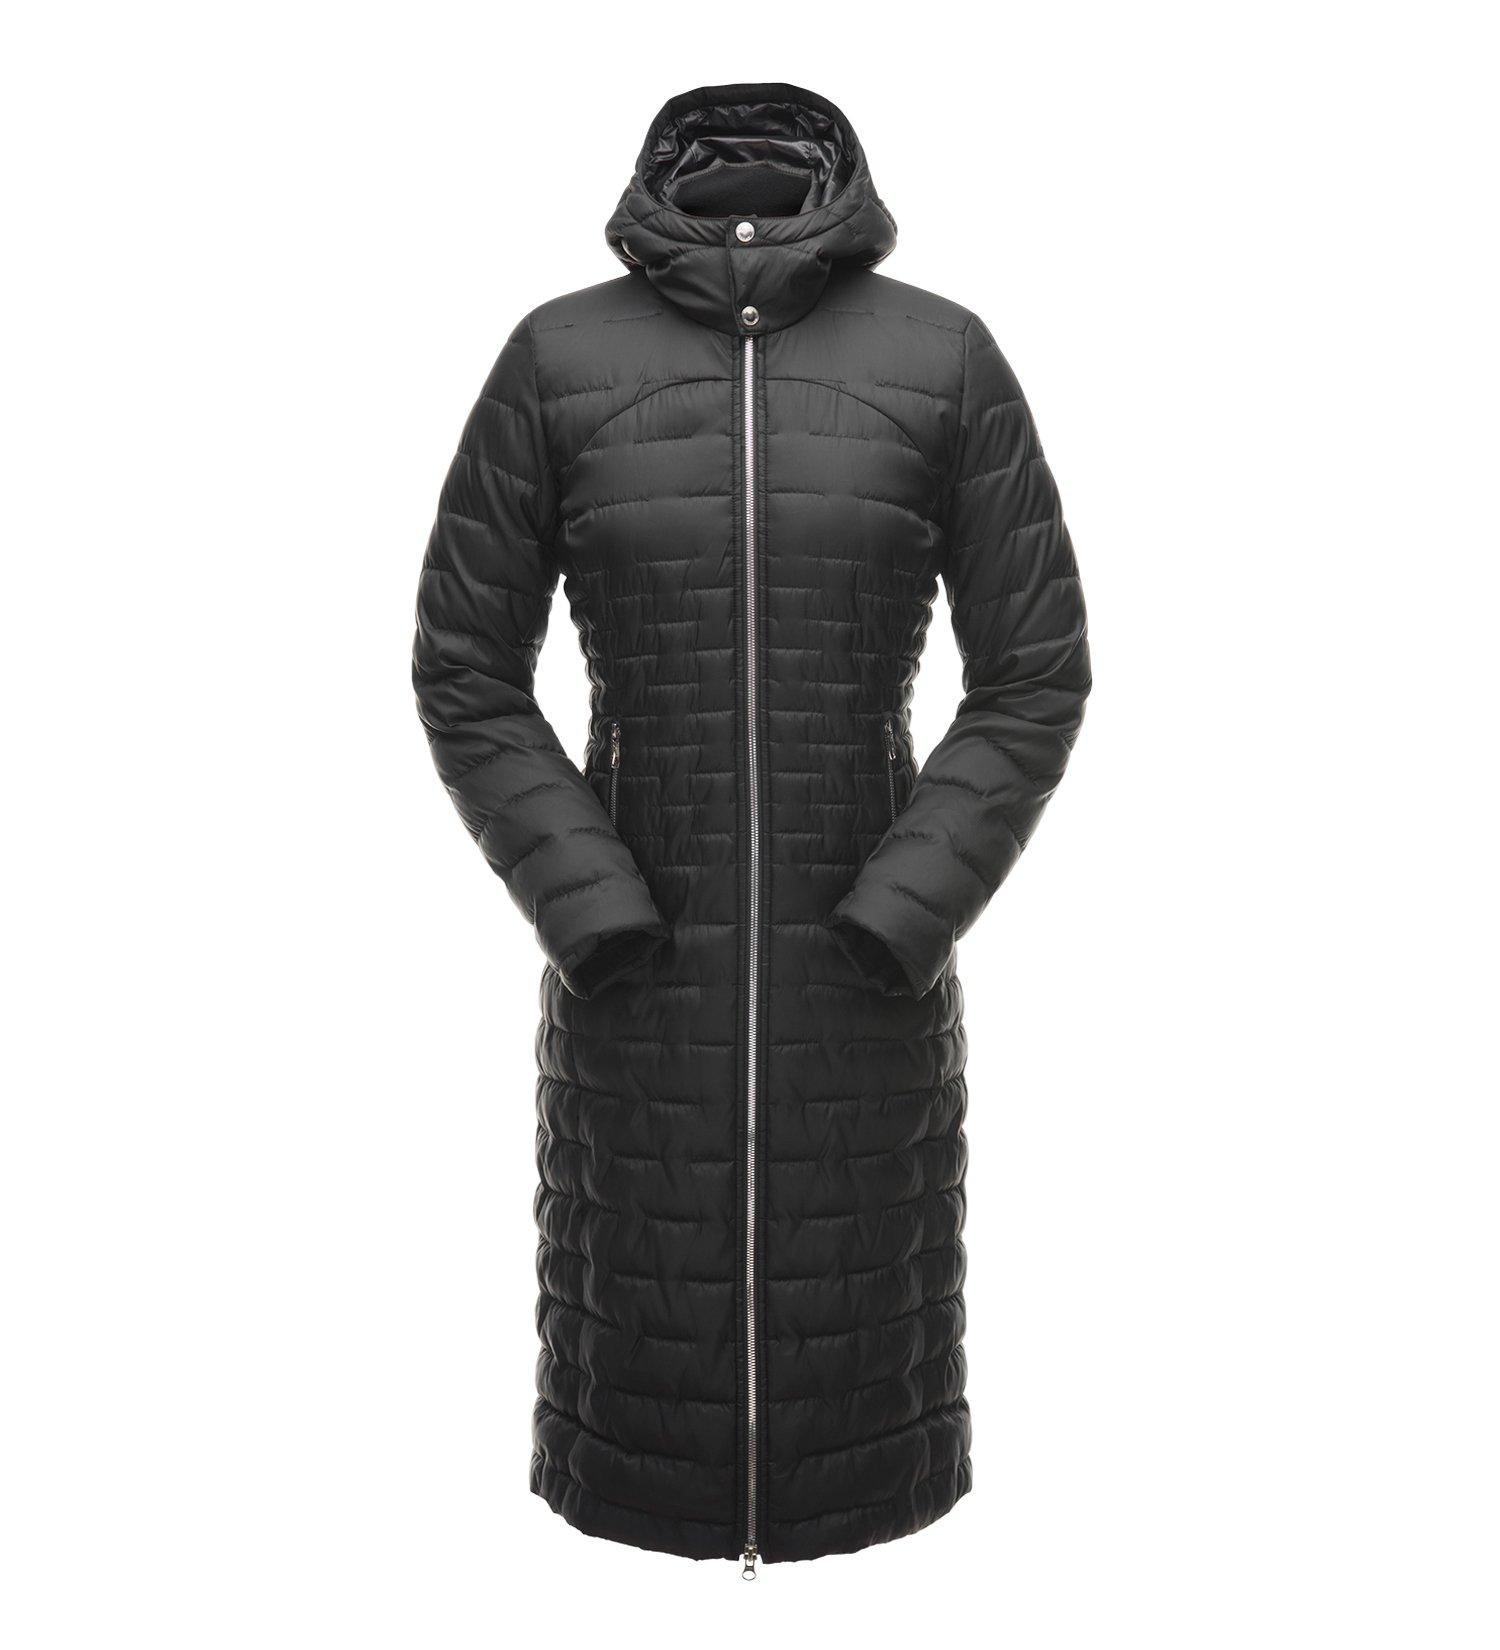 Spyder Edyn Long Insulated Jacket